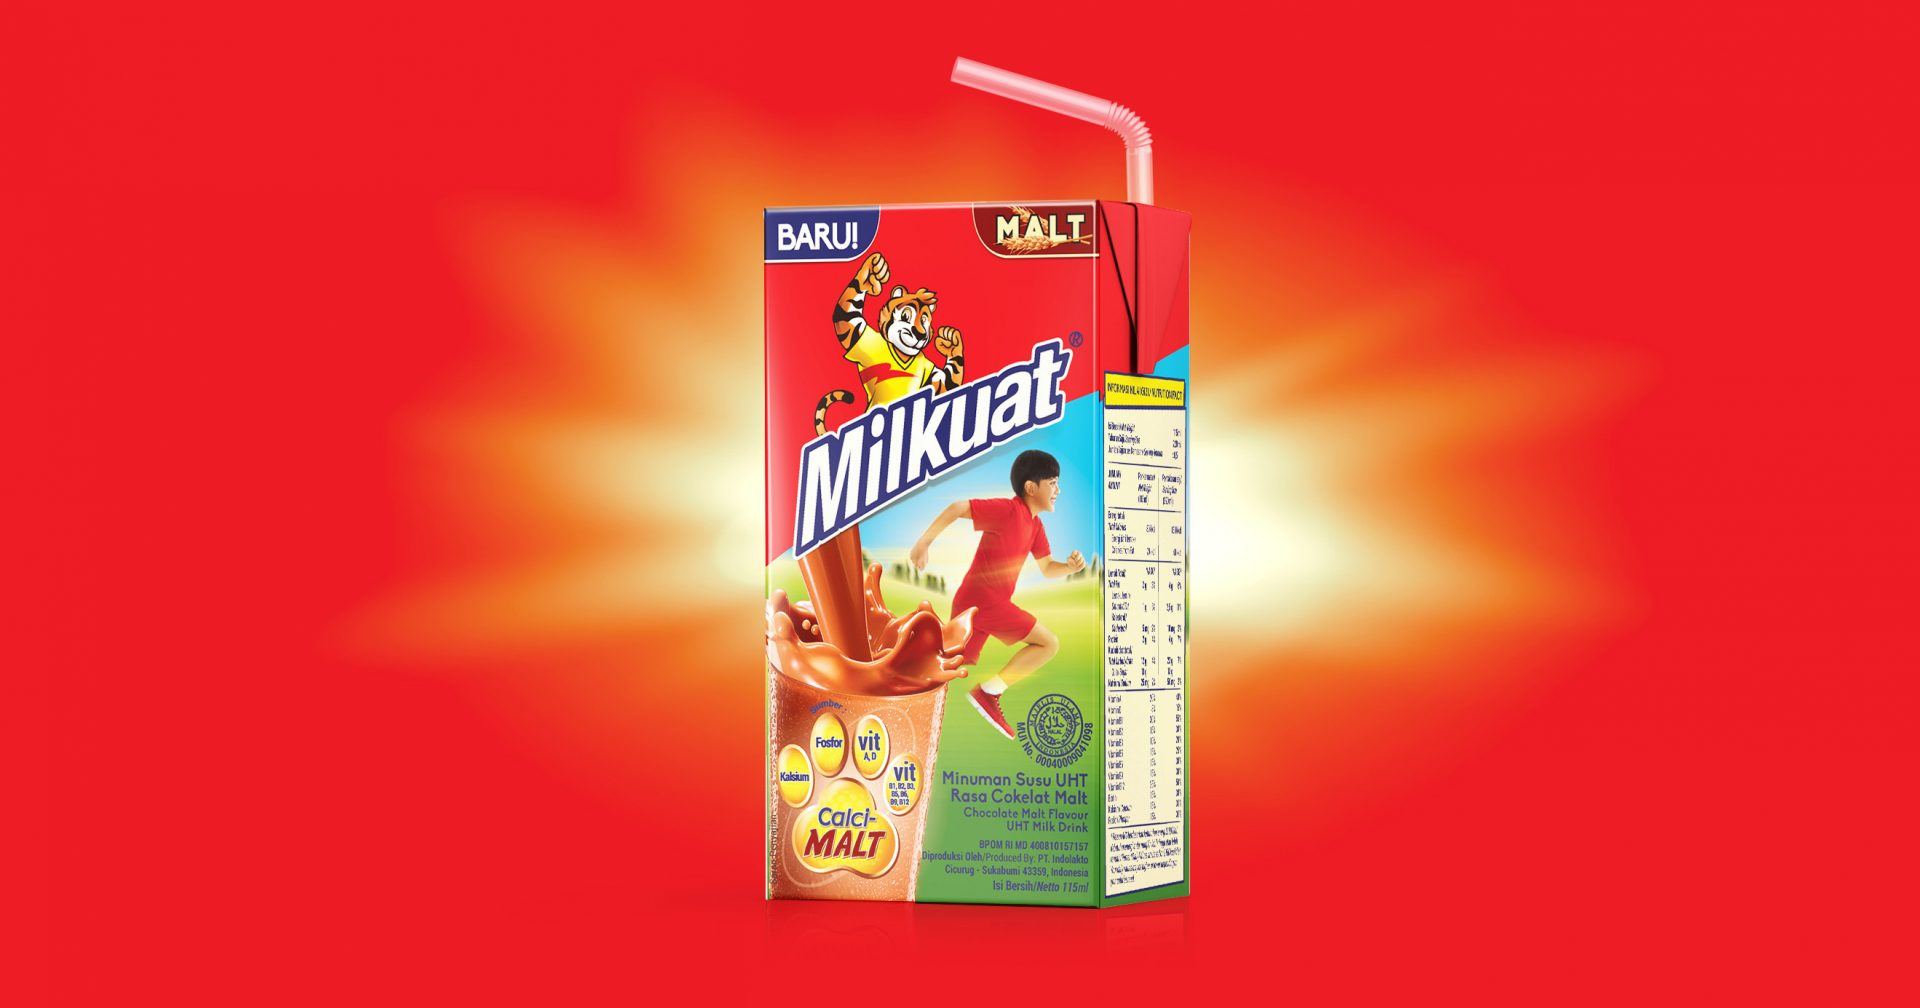 Milkuat Packaging Rejuvenation